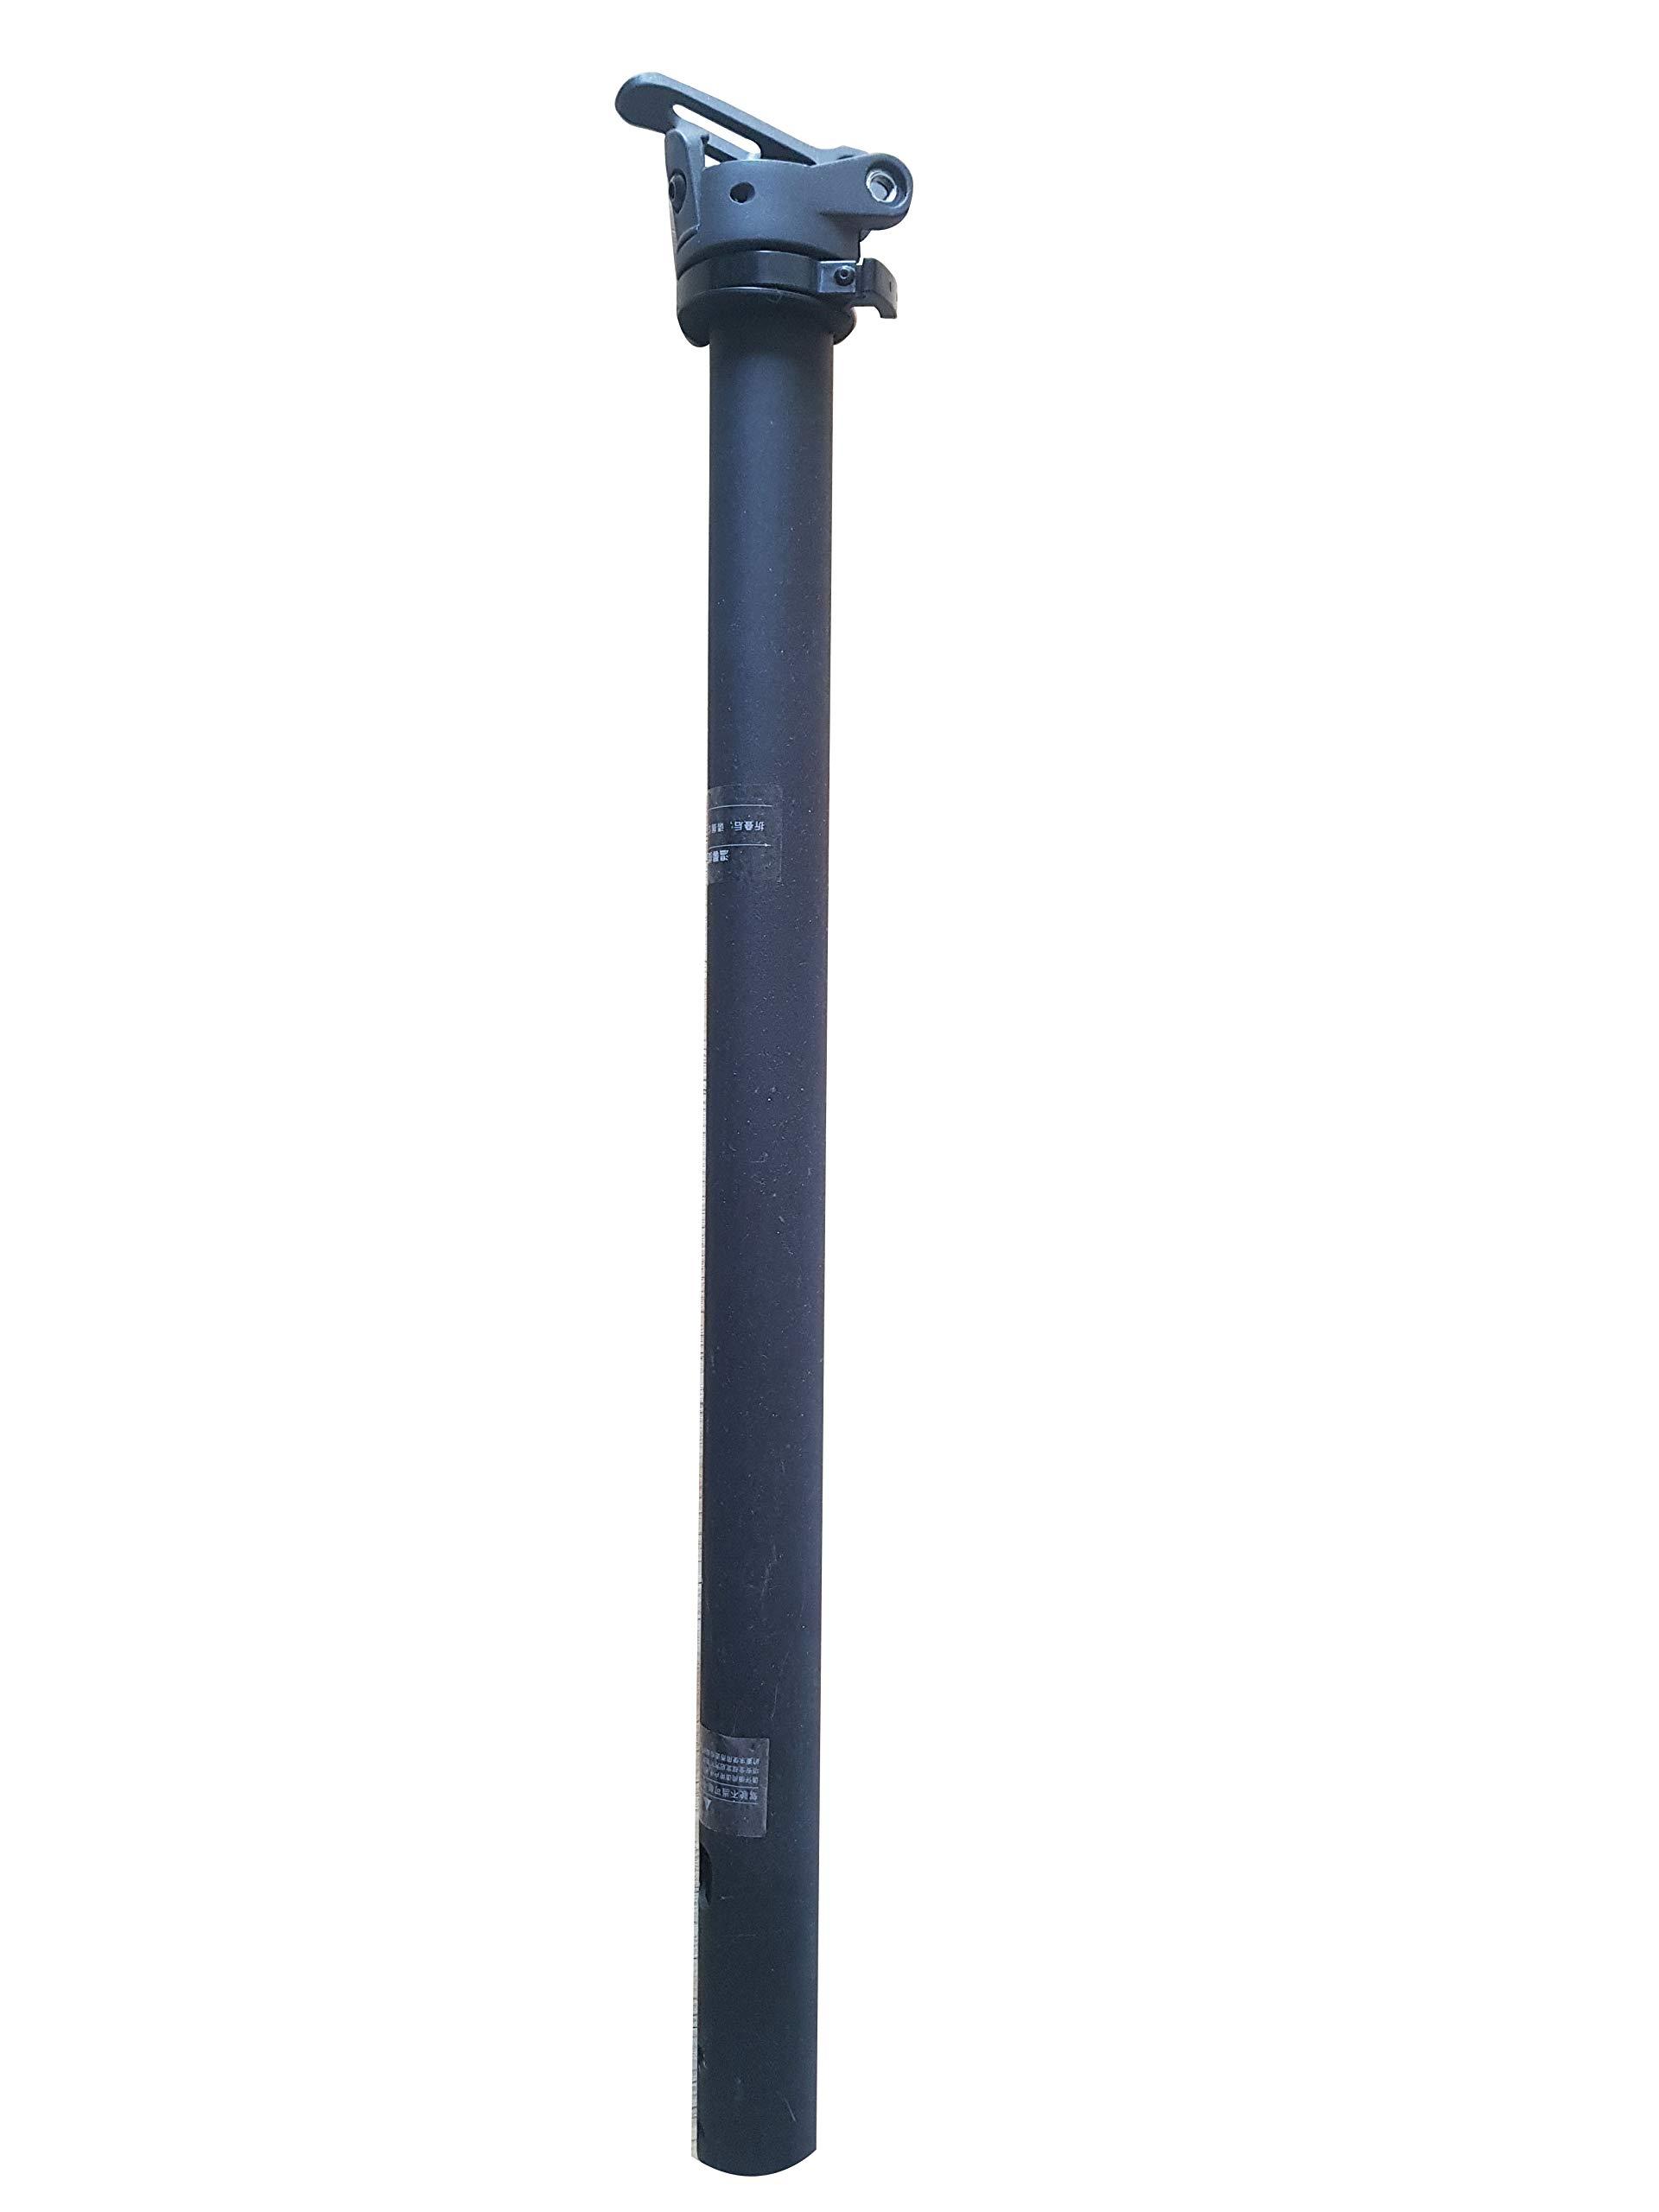 SPEDWHEL Original Folding Pole Replacement Part for XIAOMI MIJIA M365 Electric Scooter (Black)